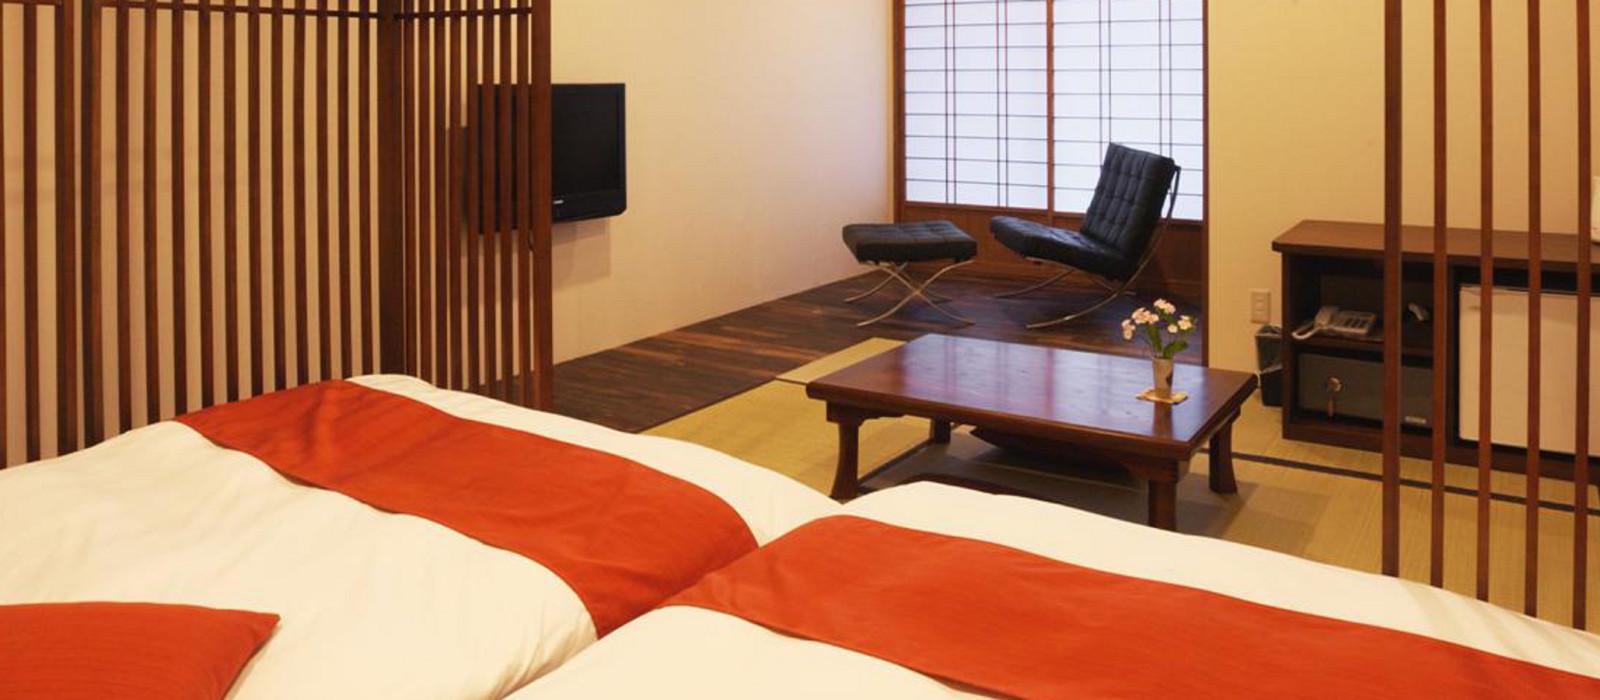 Hotel Shinanoki Ichinoyu Ryokan Japan